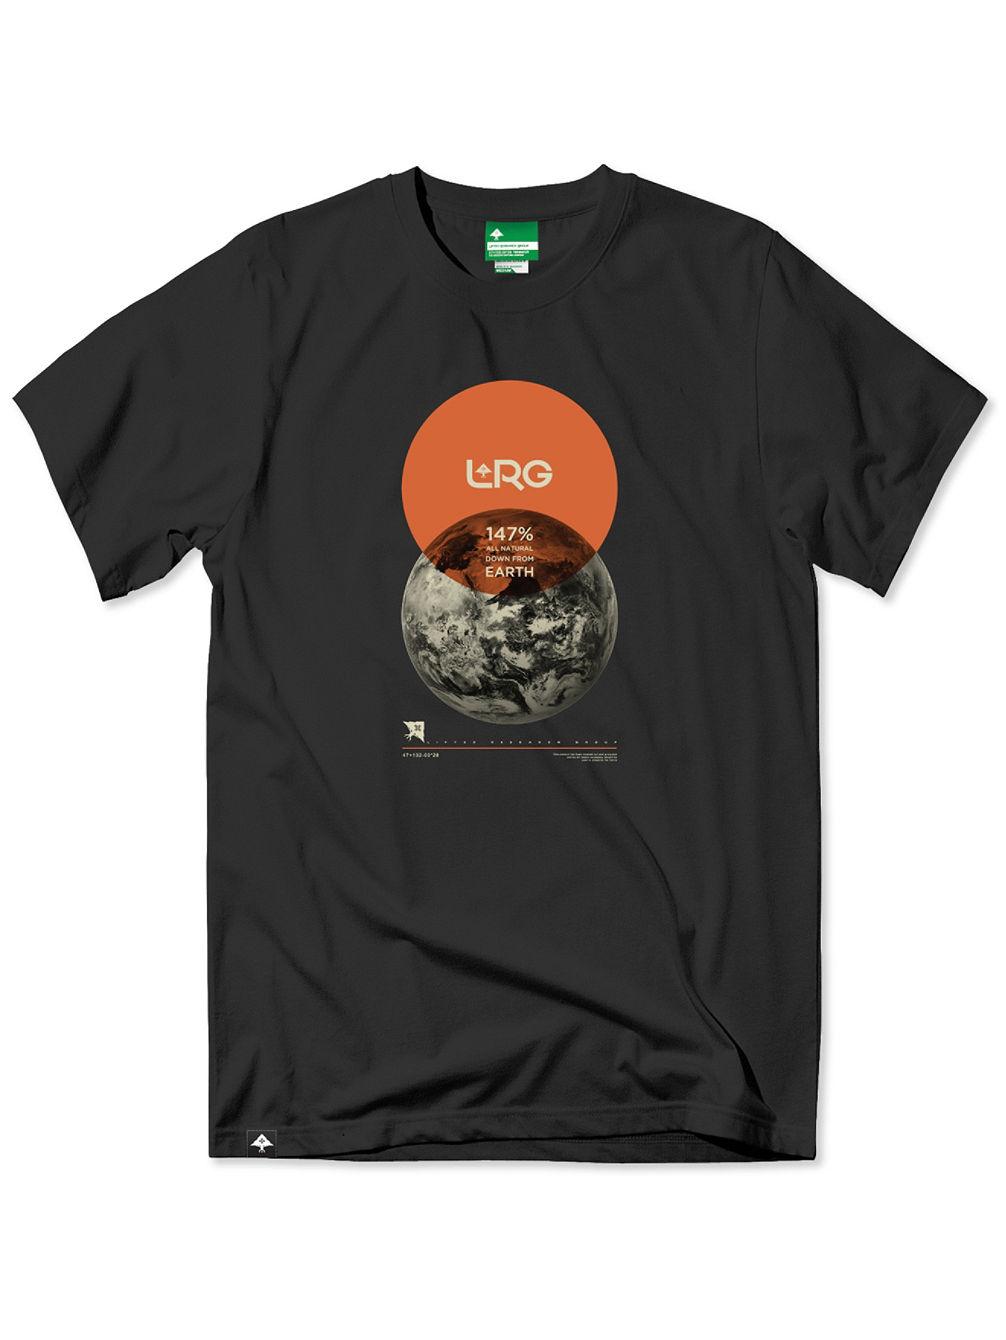 lrg-147-earth-t-shirt